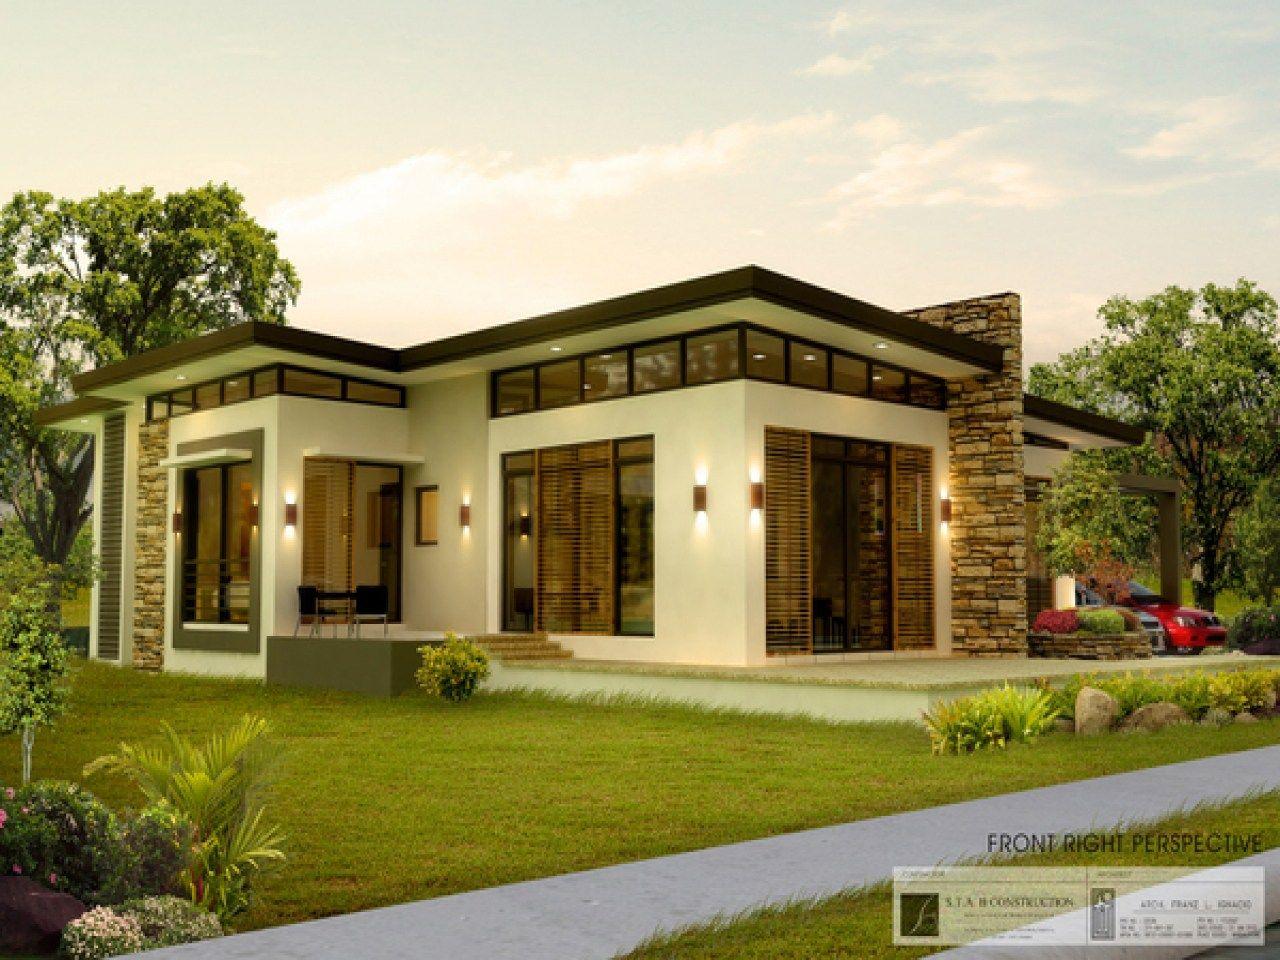 Home plans philippines bungalow house design tokjanggutphoto also rh ar pinterest